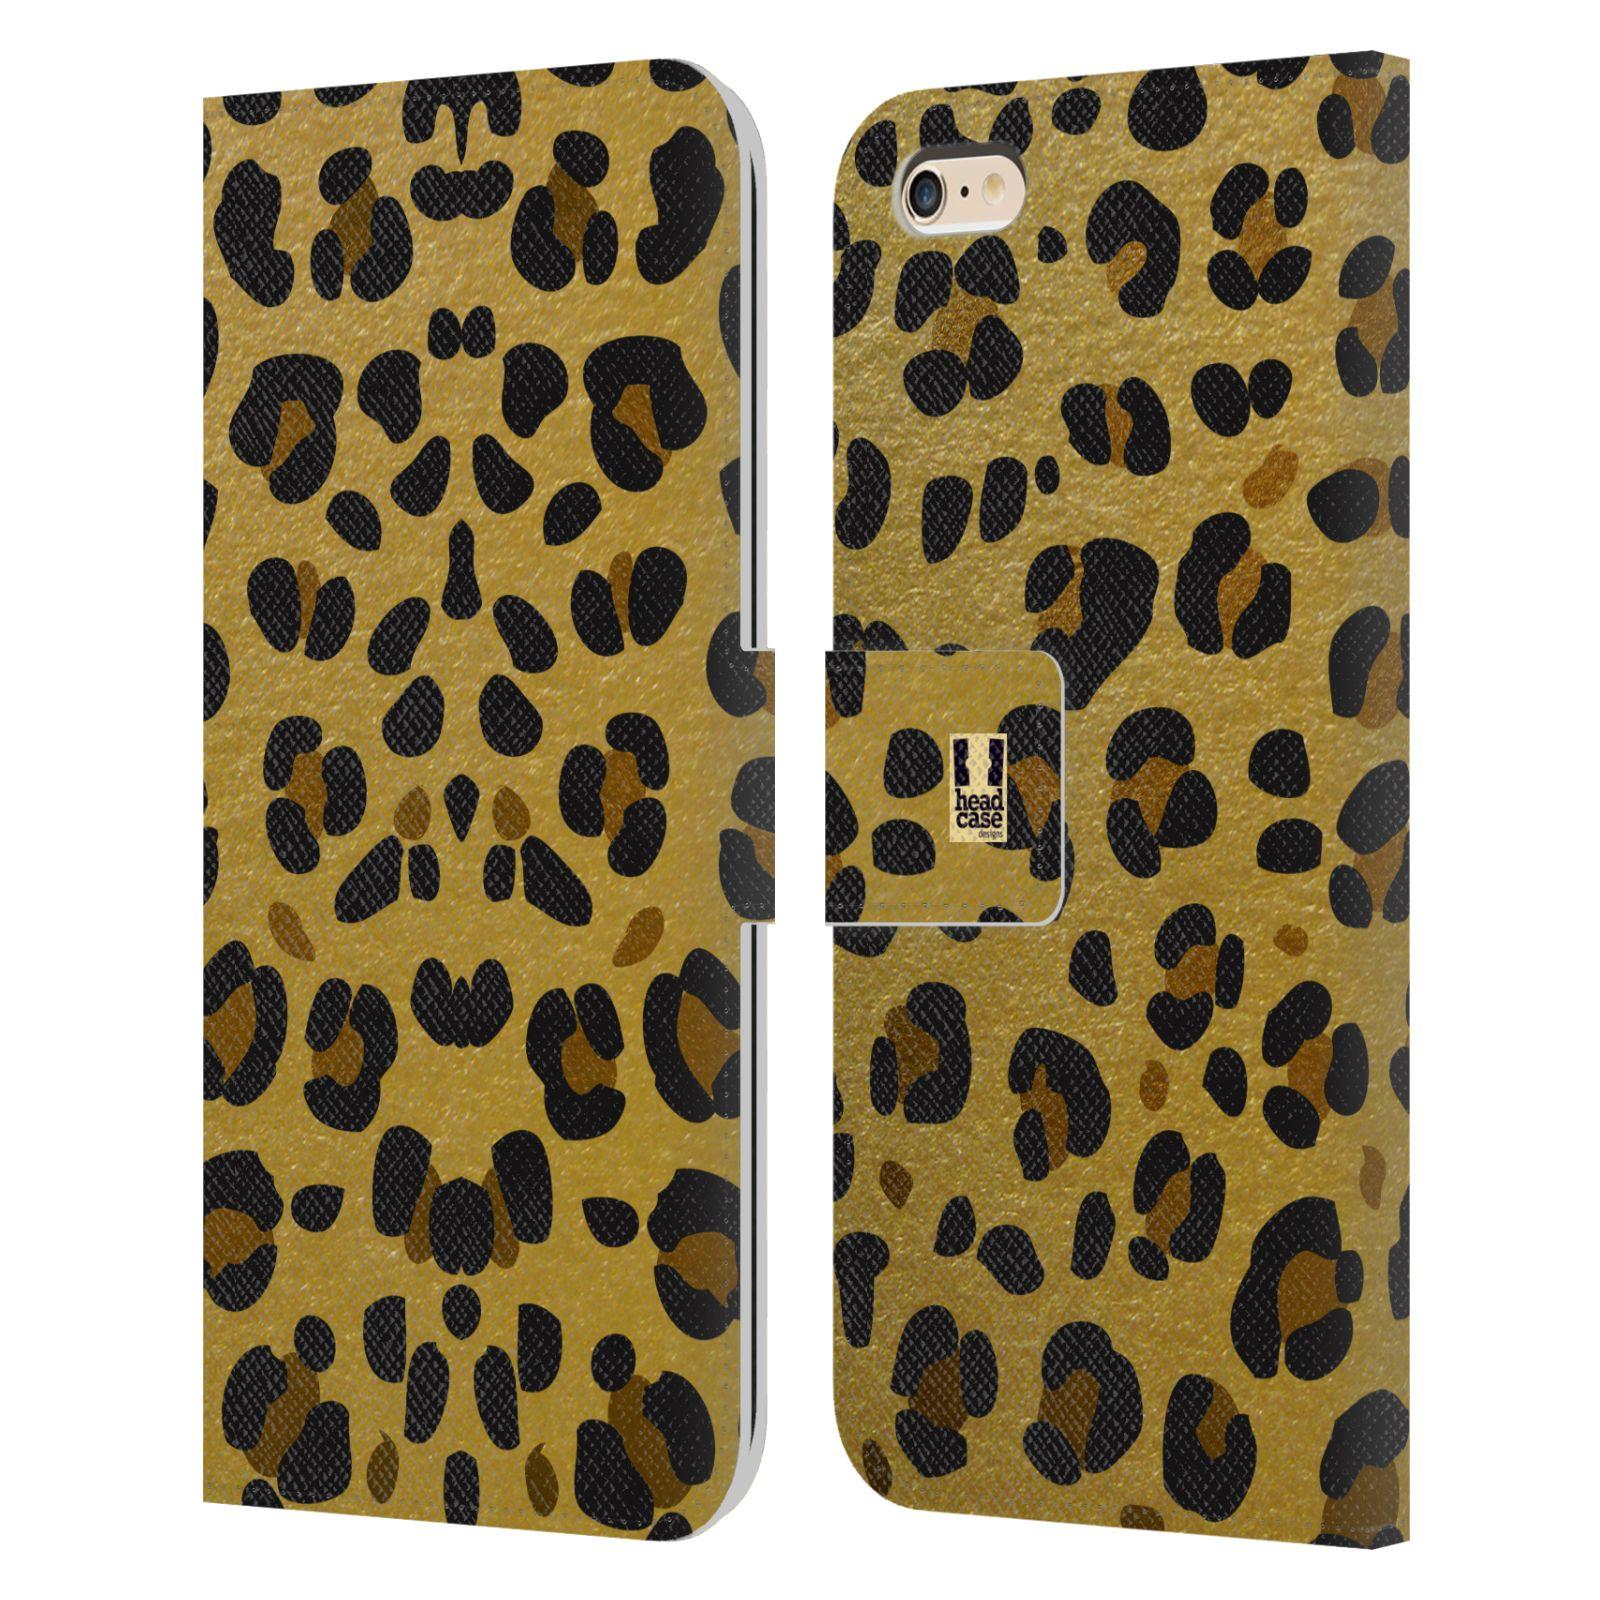 Pouzdro na mobil Apple Iphone 6 PLUS / 6S PLUS - Head Case - Fashion zvířecí vzor